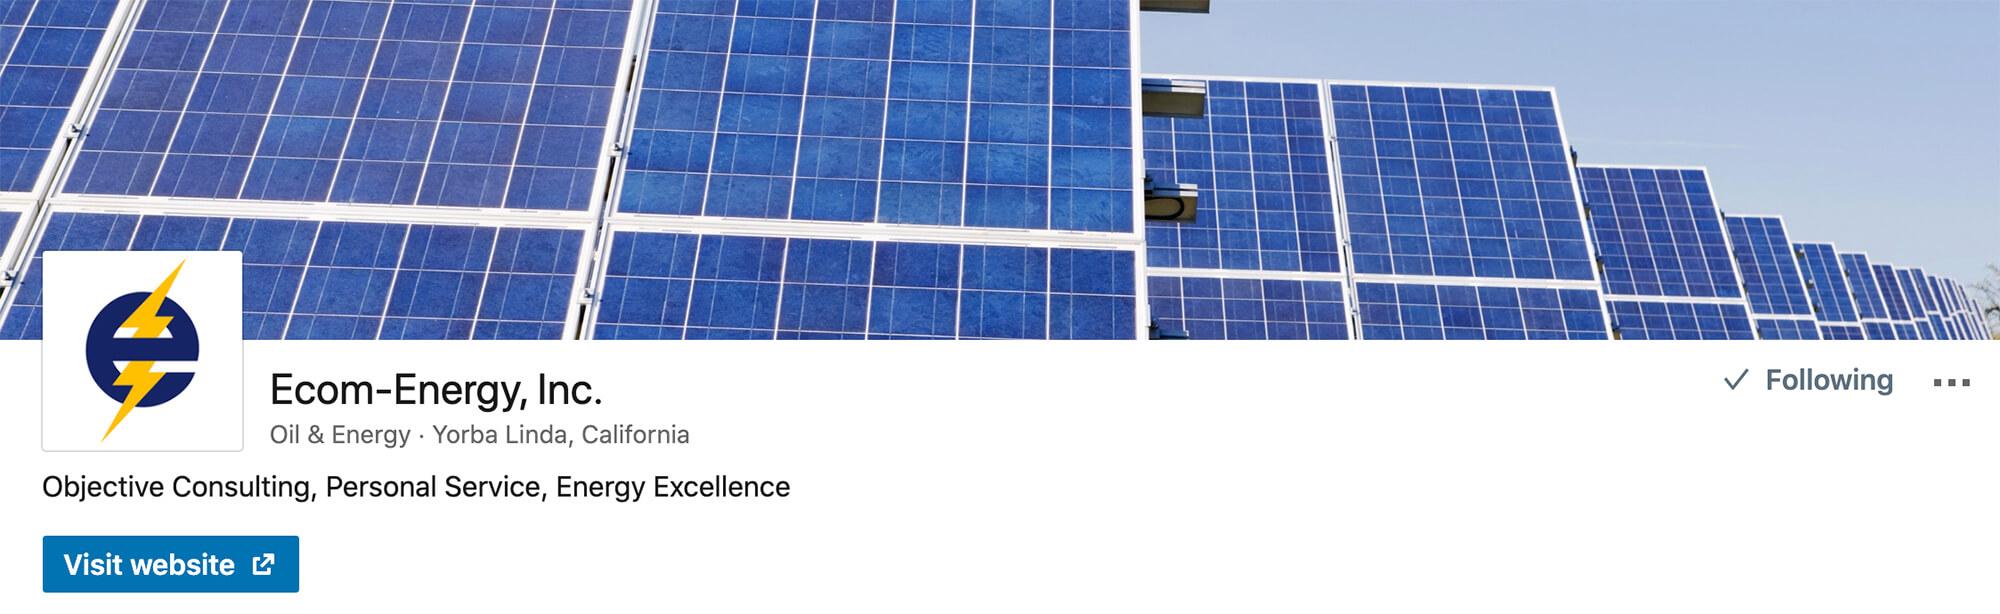 Ecom-Energy's LinkedIn Company Profile